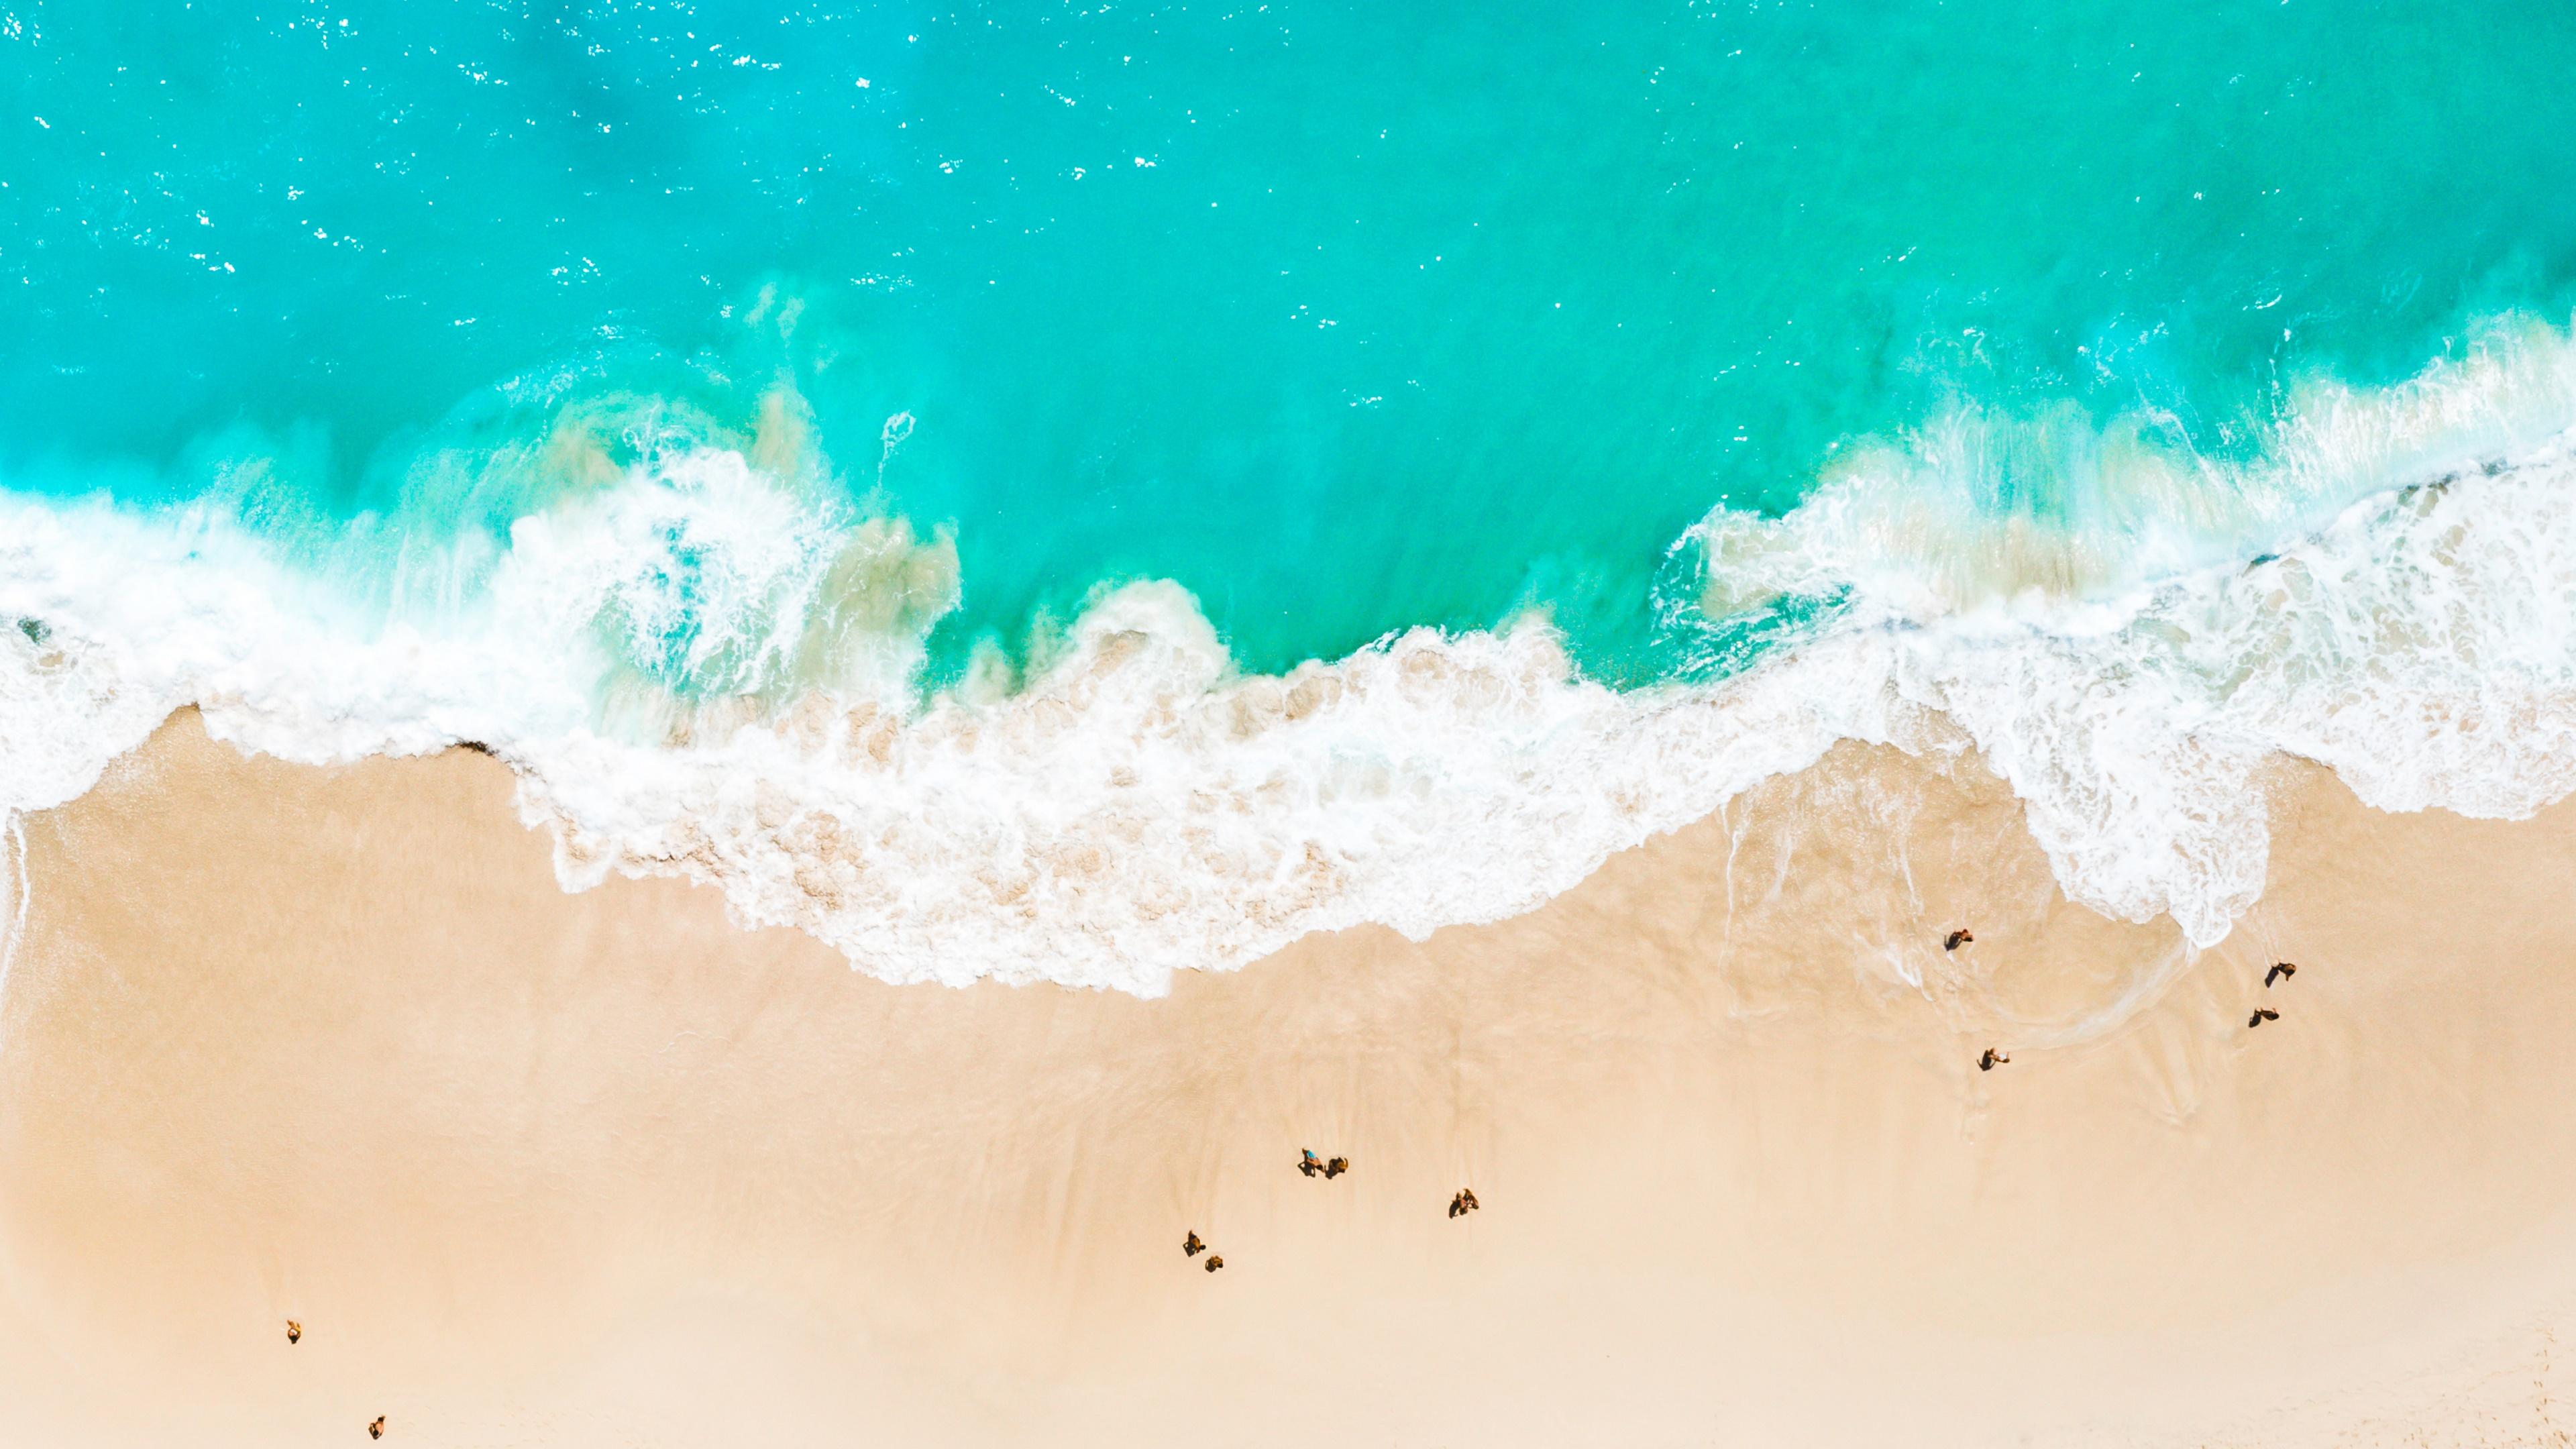 Waves, seaside, beach wallpaper